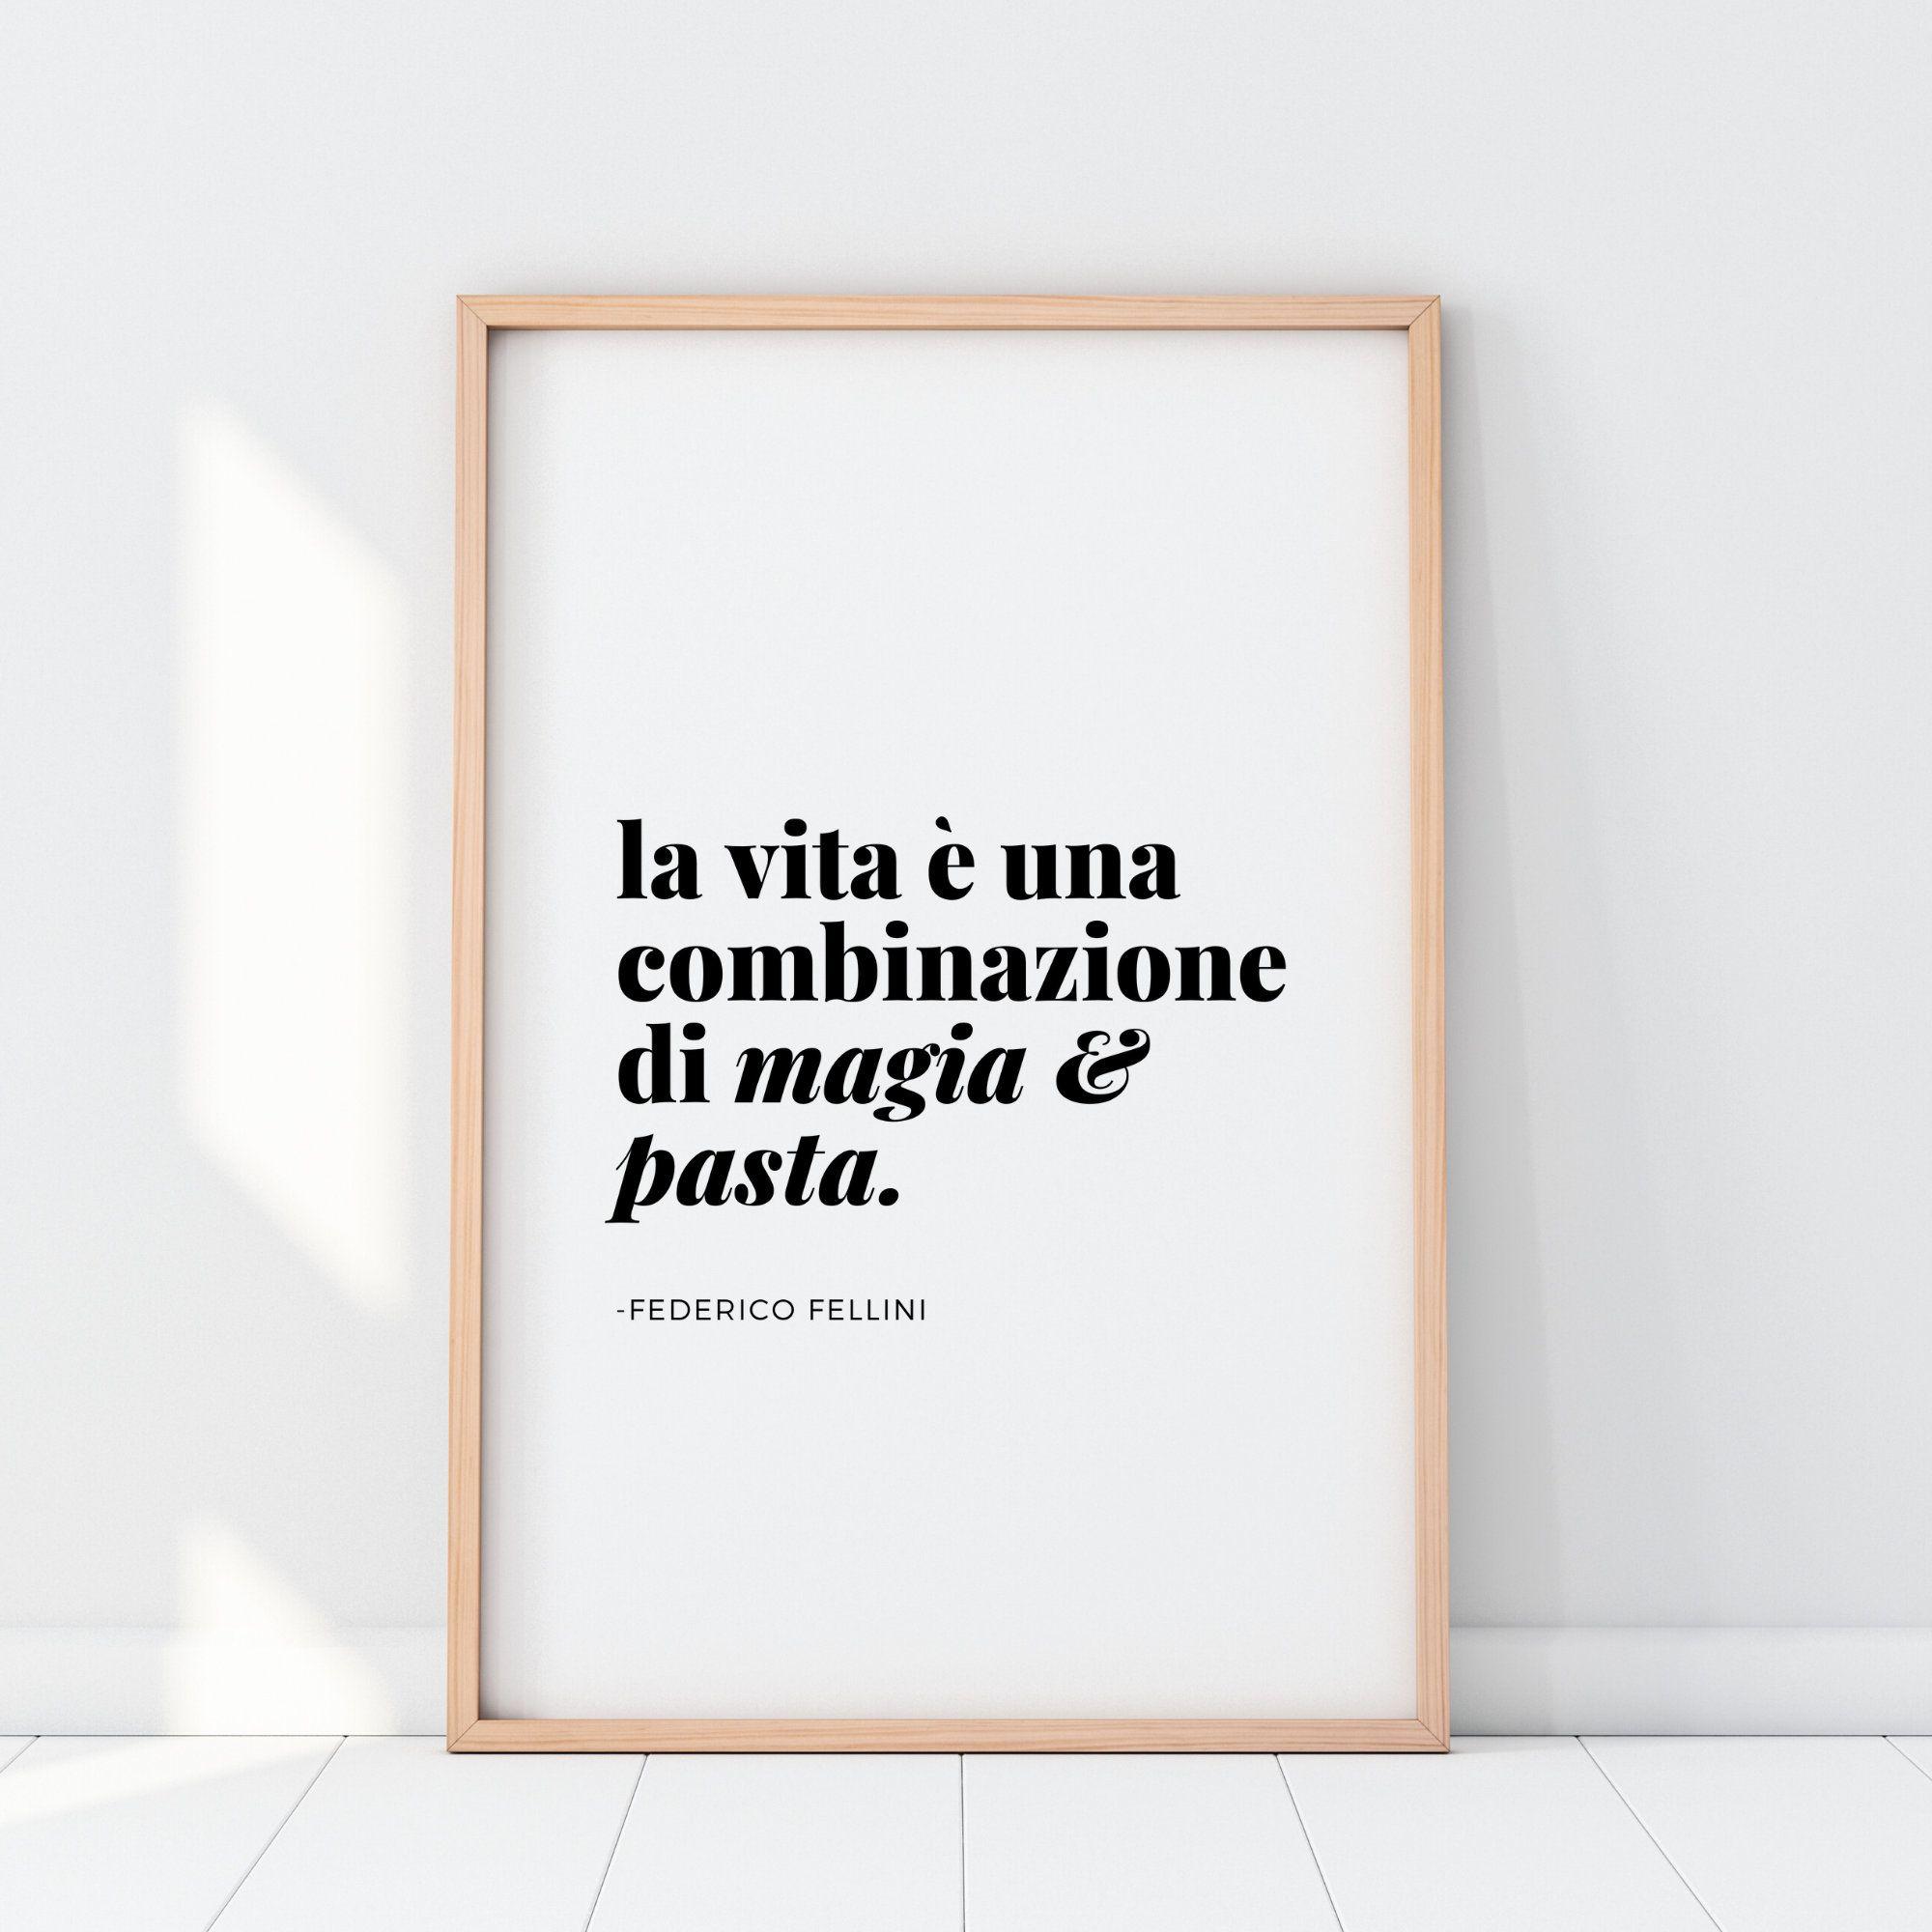 Magic & Pasta Art Print in Italian - Fellini Quote Art Print - Italy Lovers Gifts - Italian Language Quotes